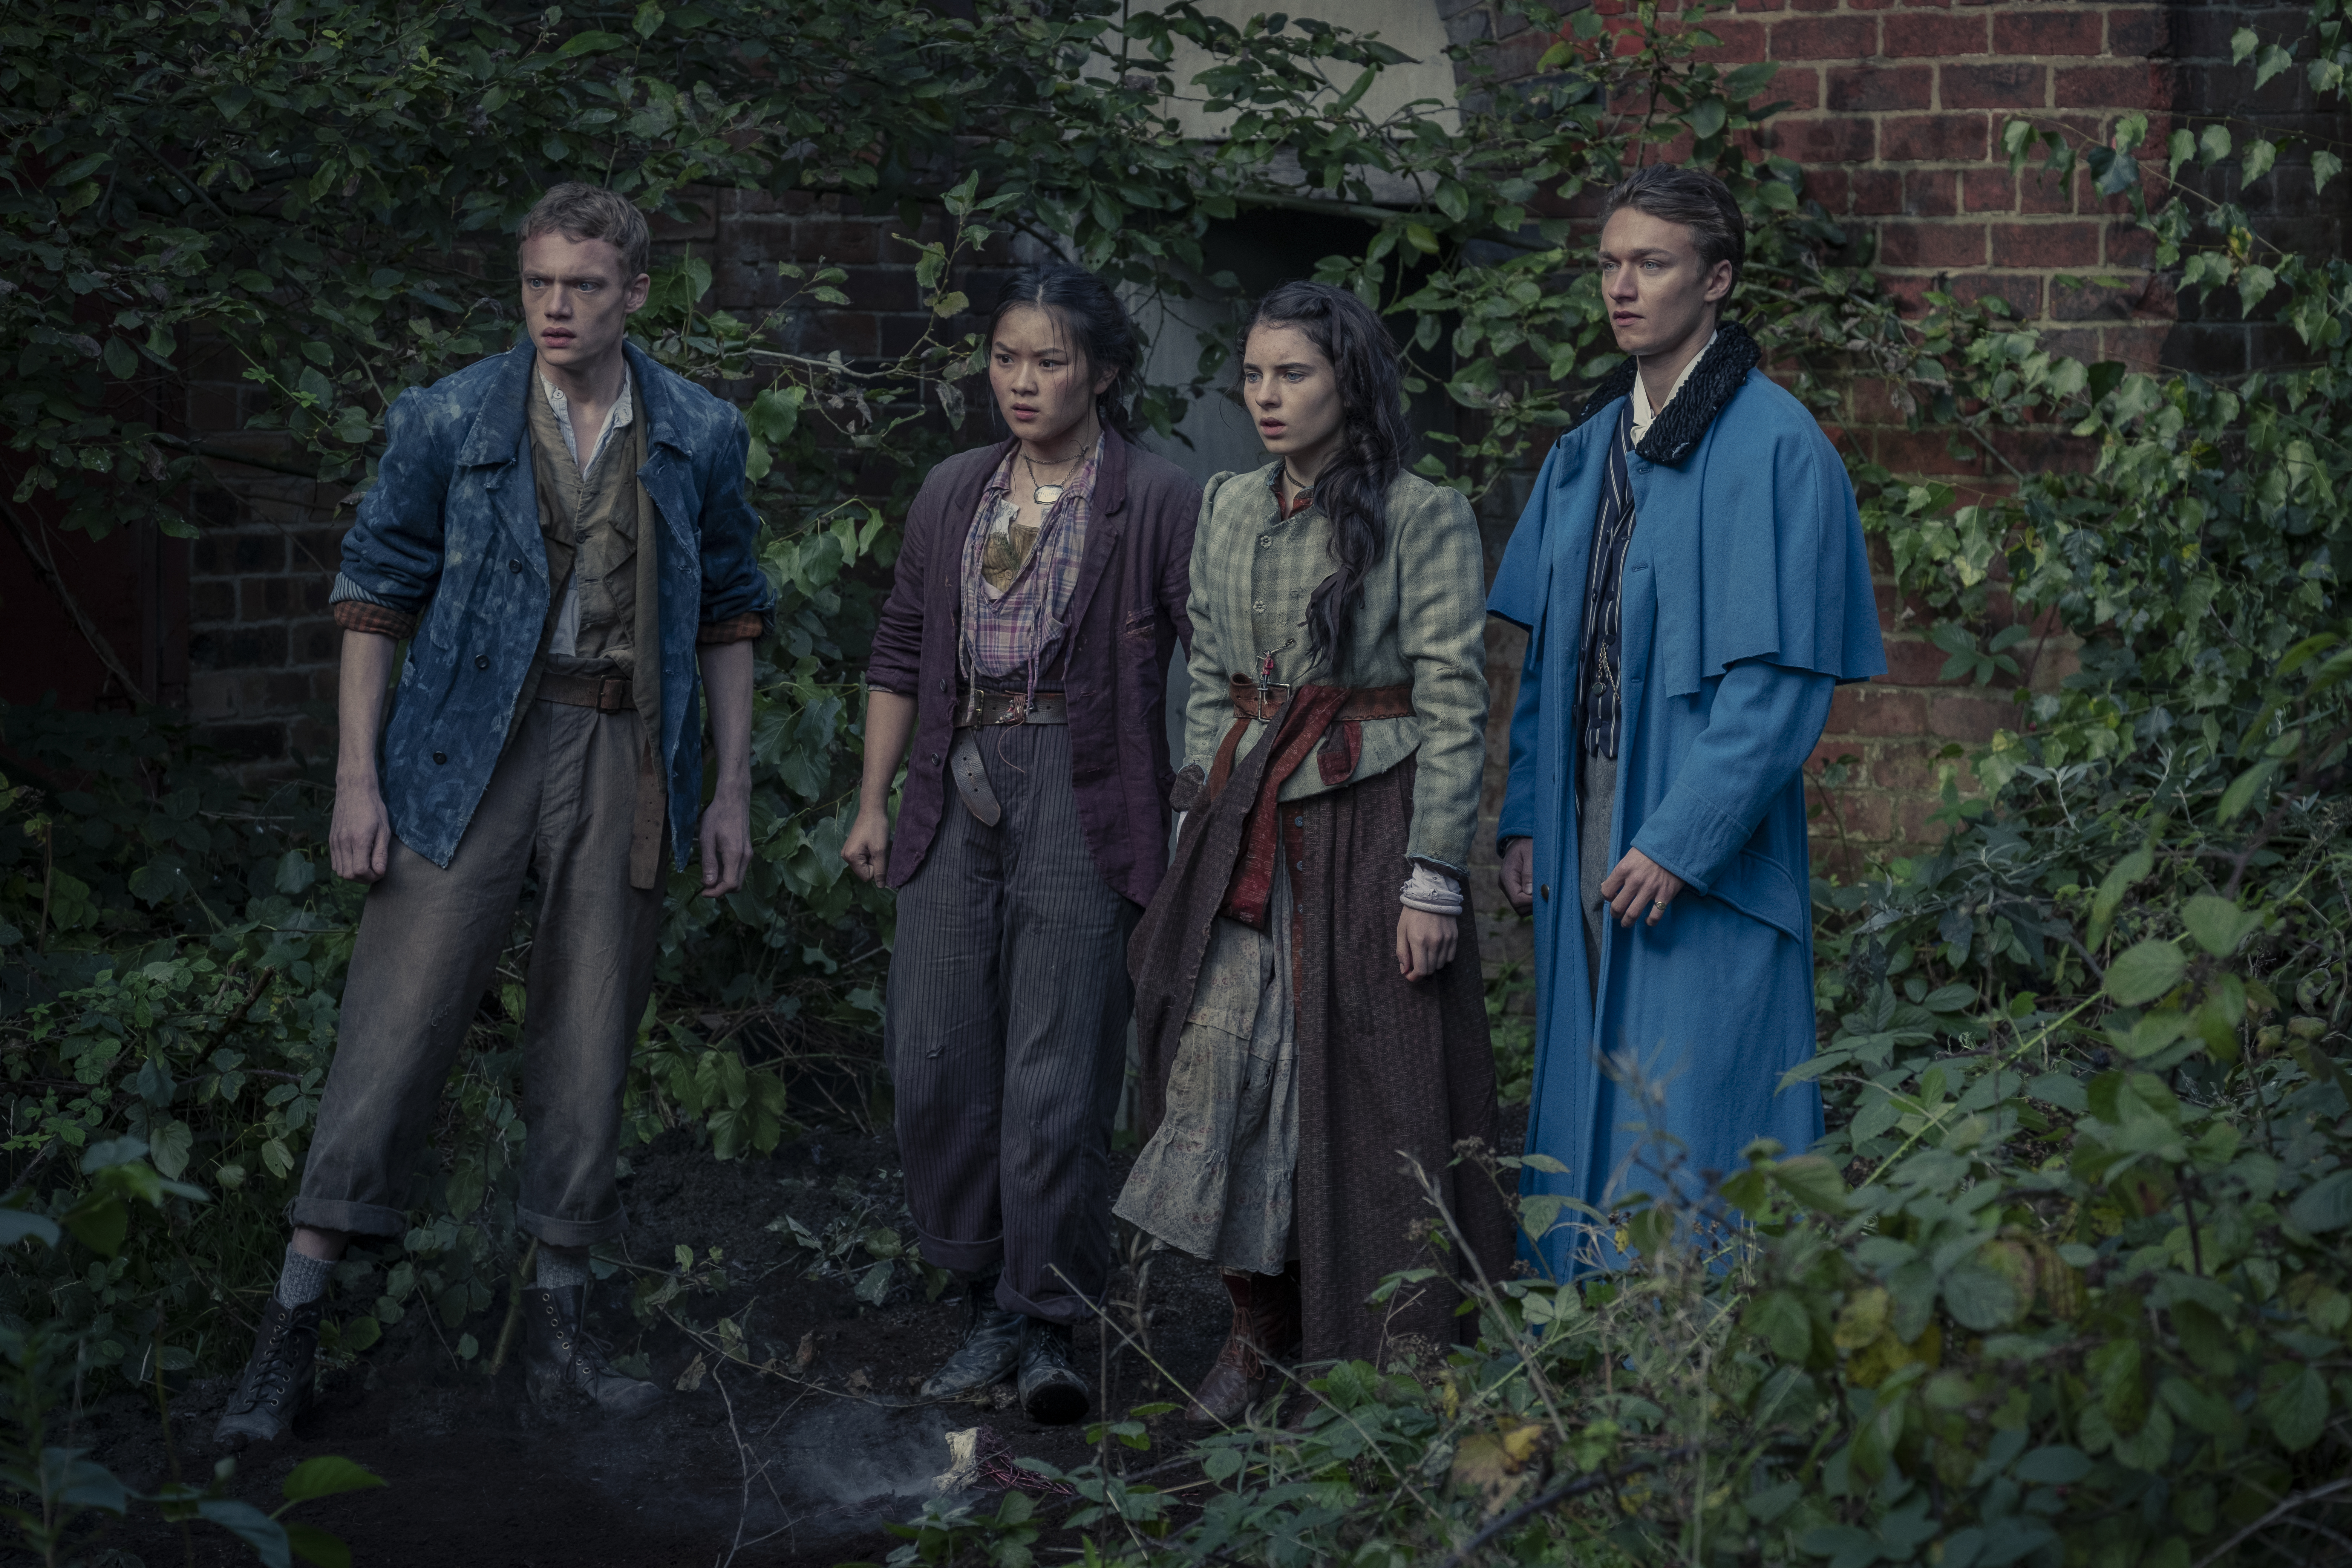 Thaddea Graham, Harrison Osterfield, Jojo Macari, and Darci Shaw in The Irregulars (2021)